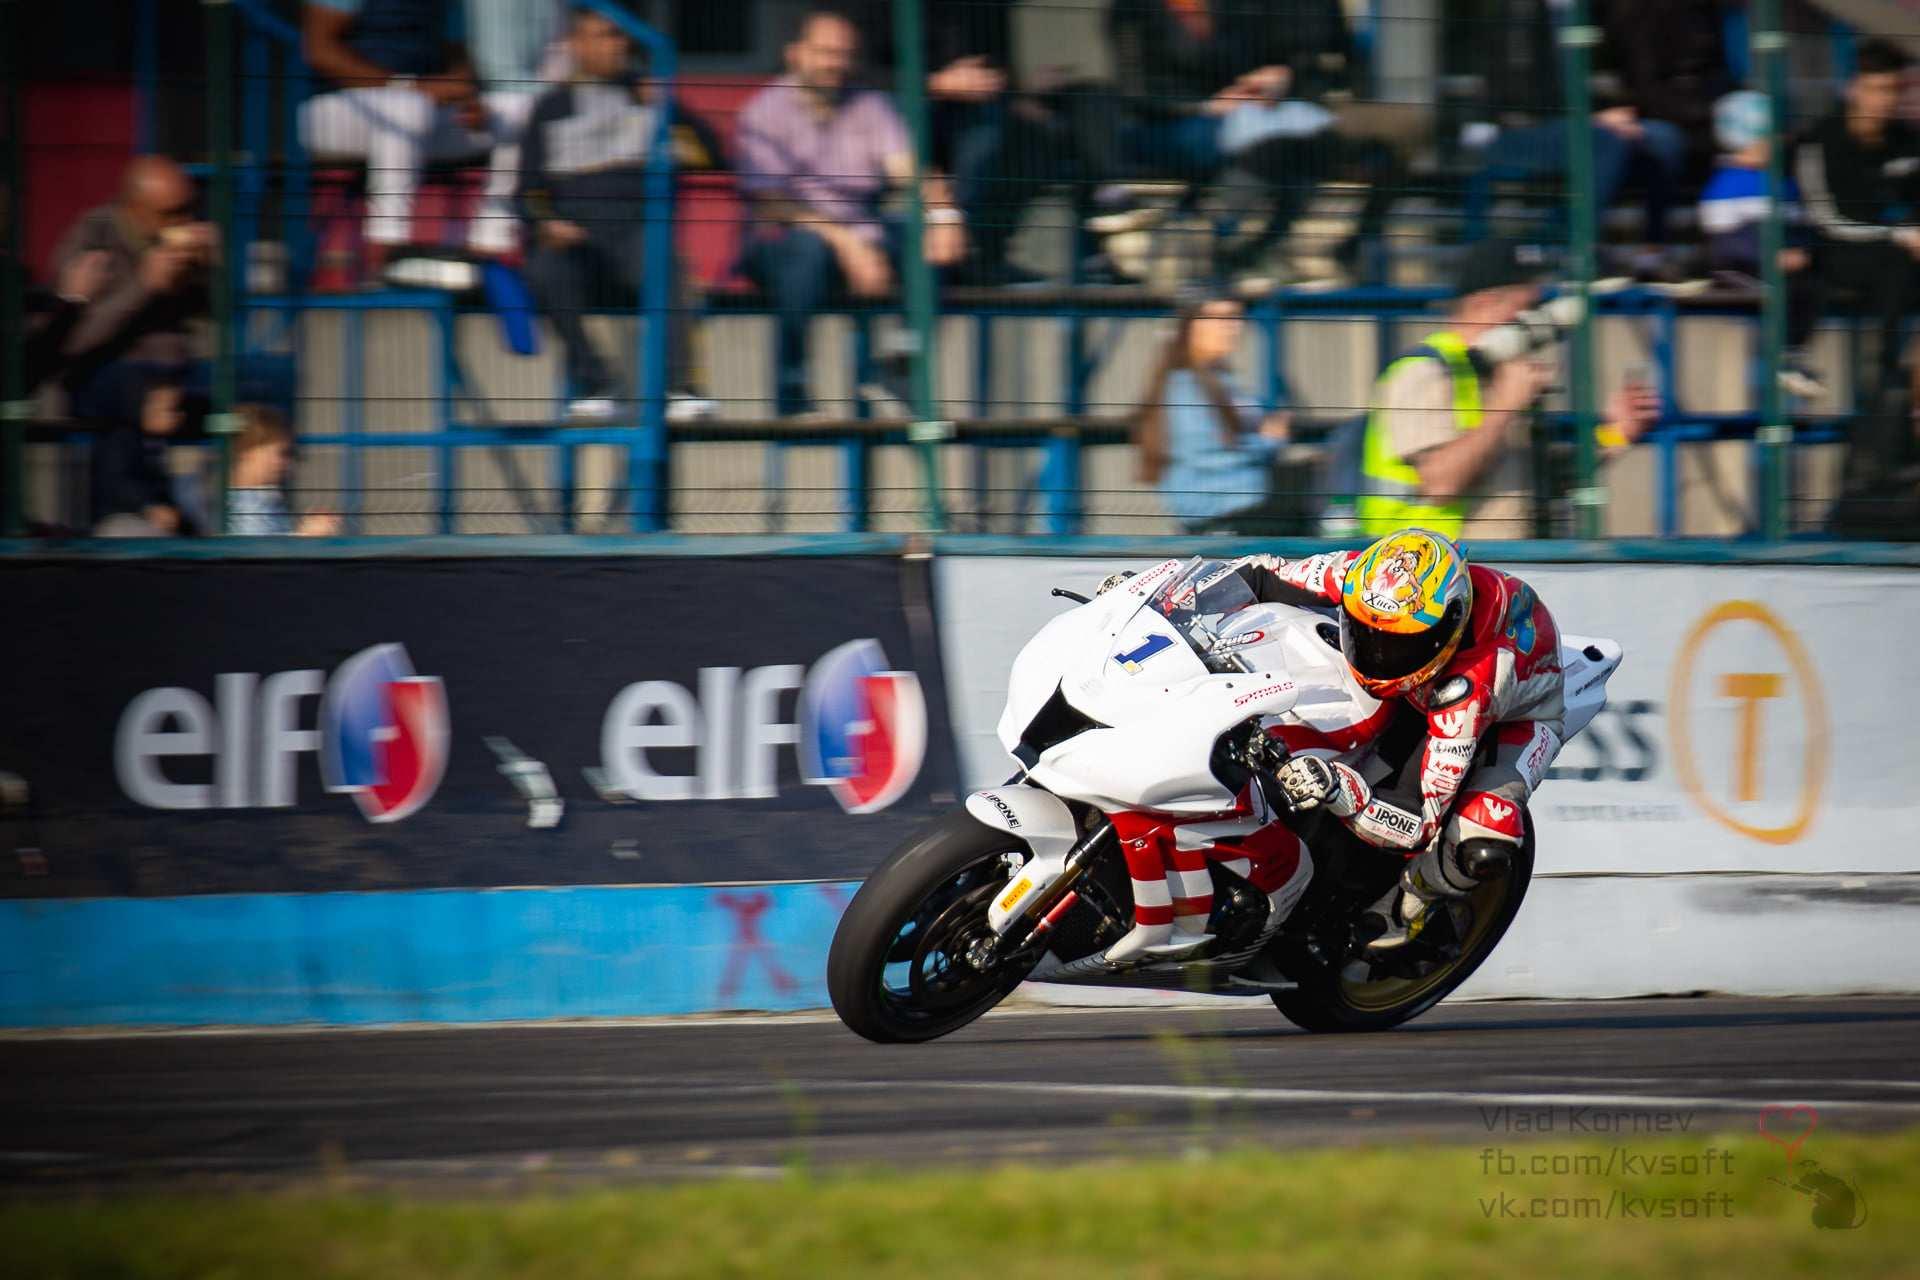 5-6_etap_MotoGPUkraine_102